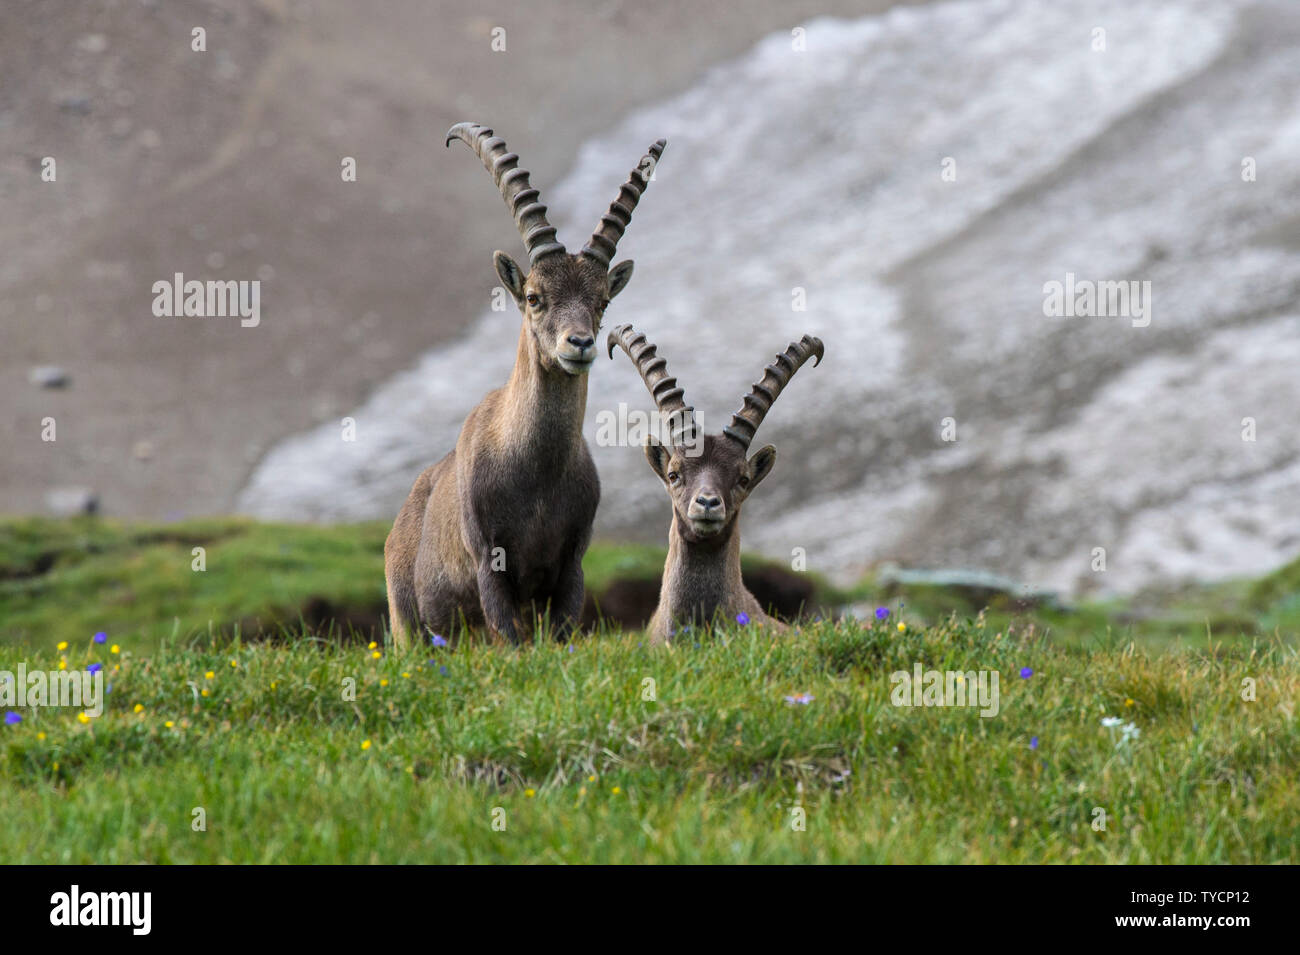 Alpine Ibex, Capra ibex, Hohe Tauern national park, Carinthia, Austria - Stock Image